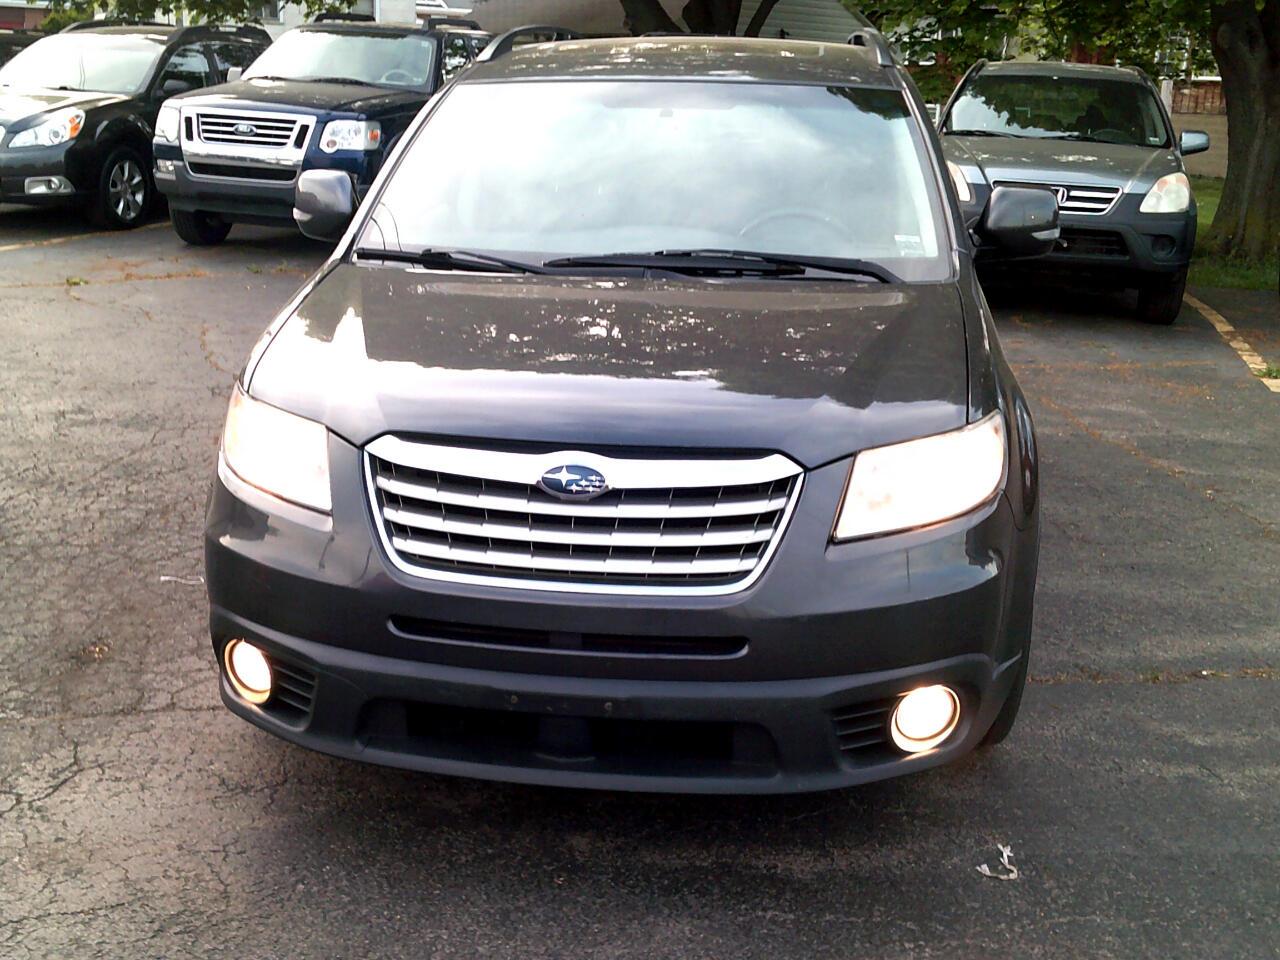 Subaru Tribeca (Natl) 4dr 5-Pass Ltd w/Nav 2008